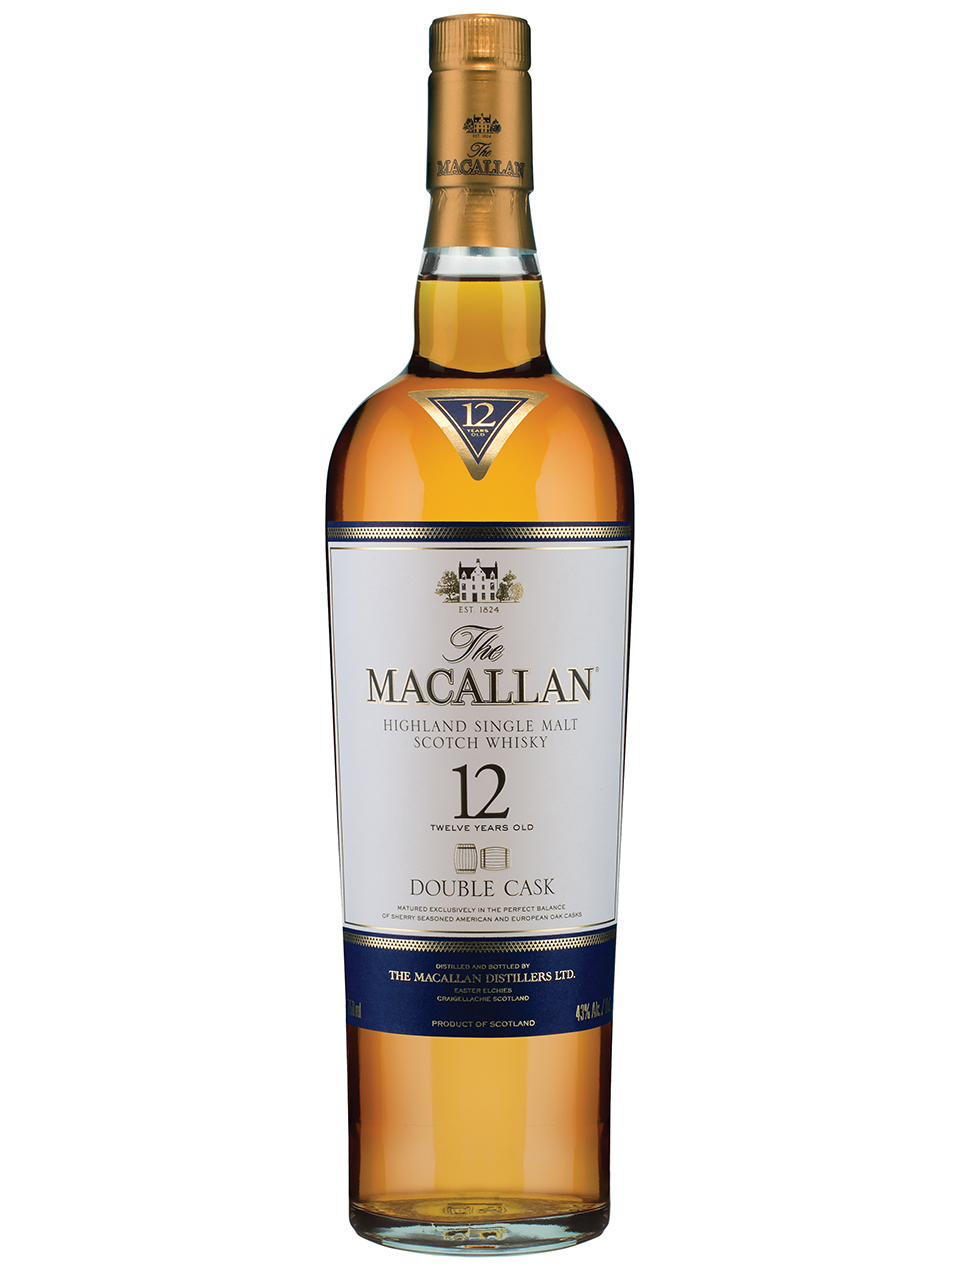 The Macallan Double Cask 12YO Scotch Whisky